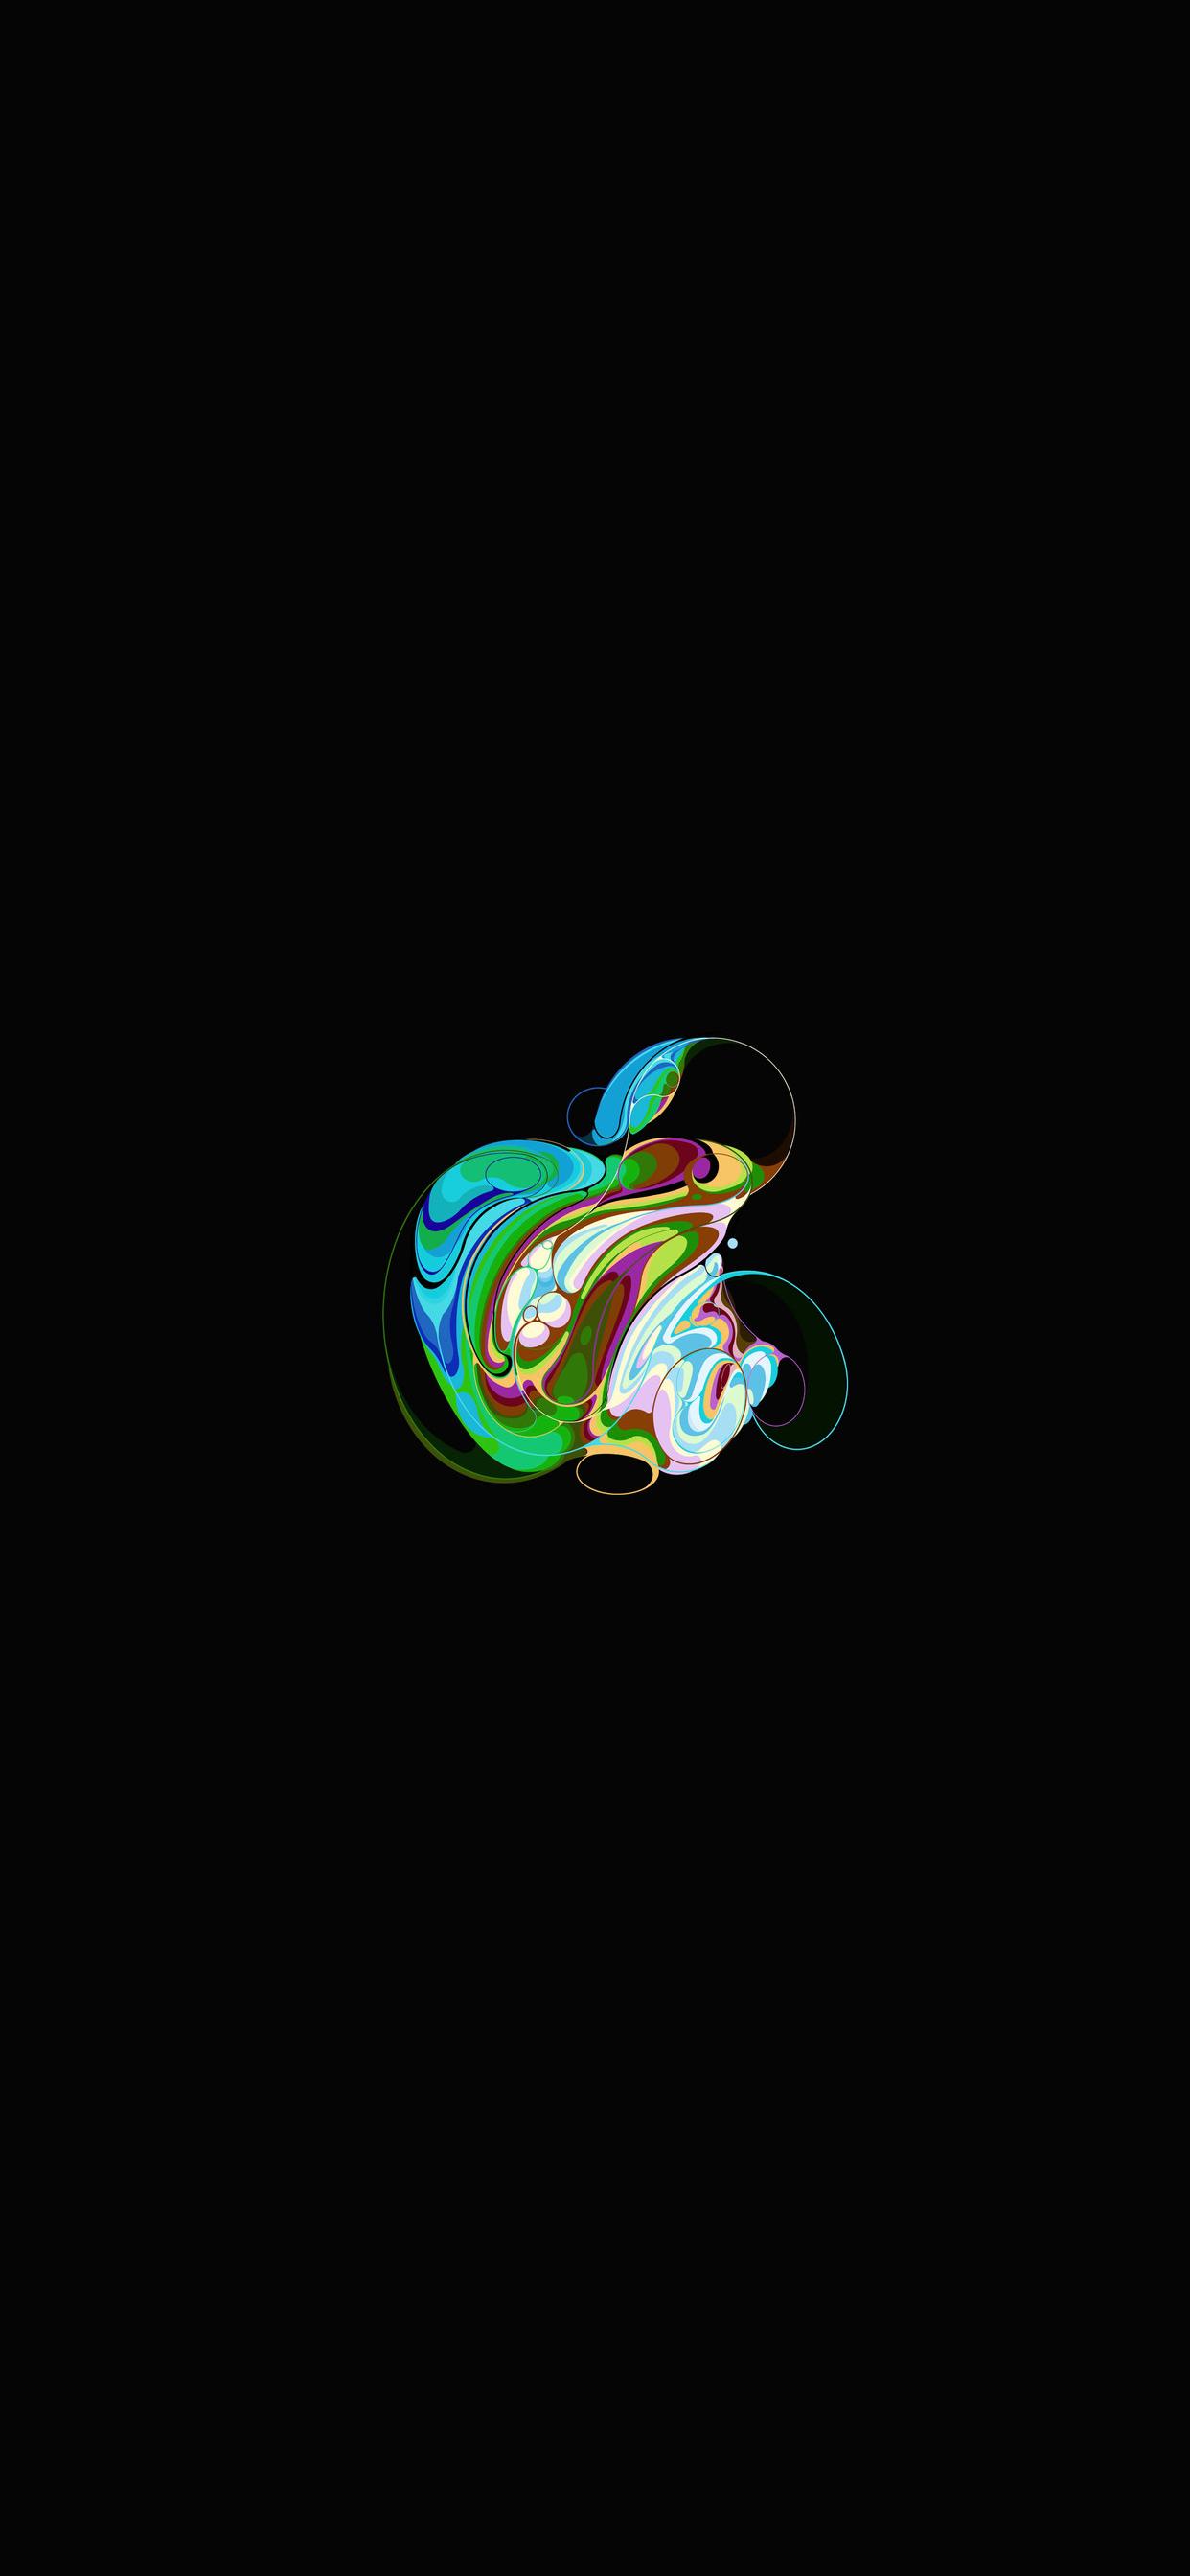 iPhone wallpaper apple logo 8 Apple logo